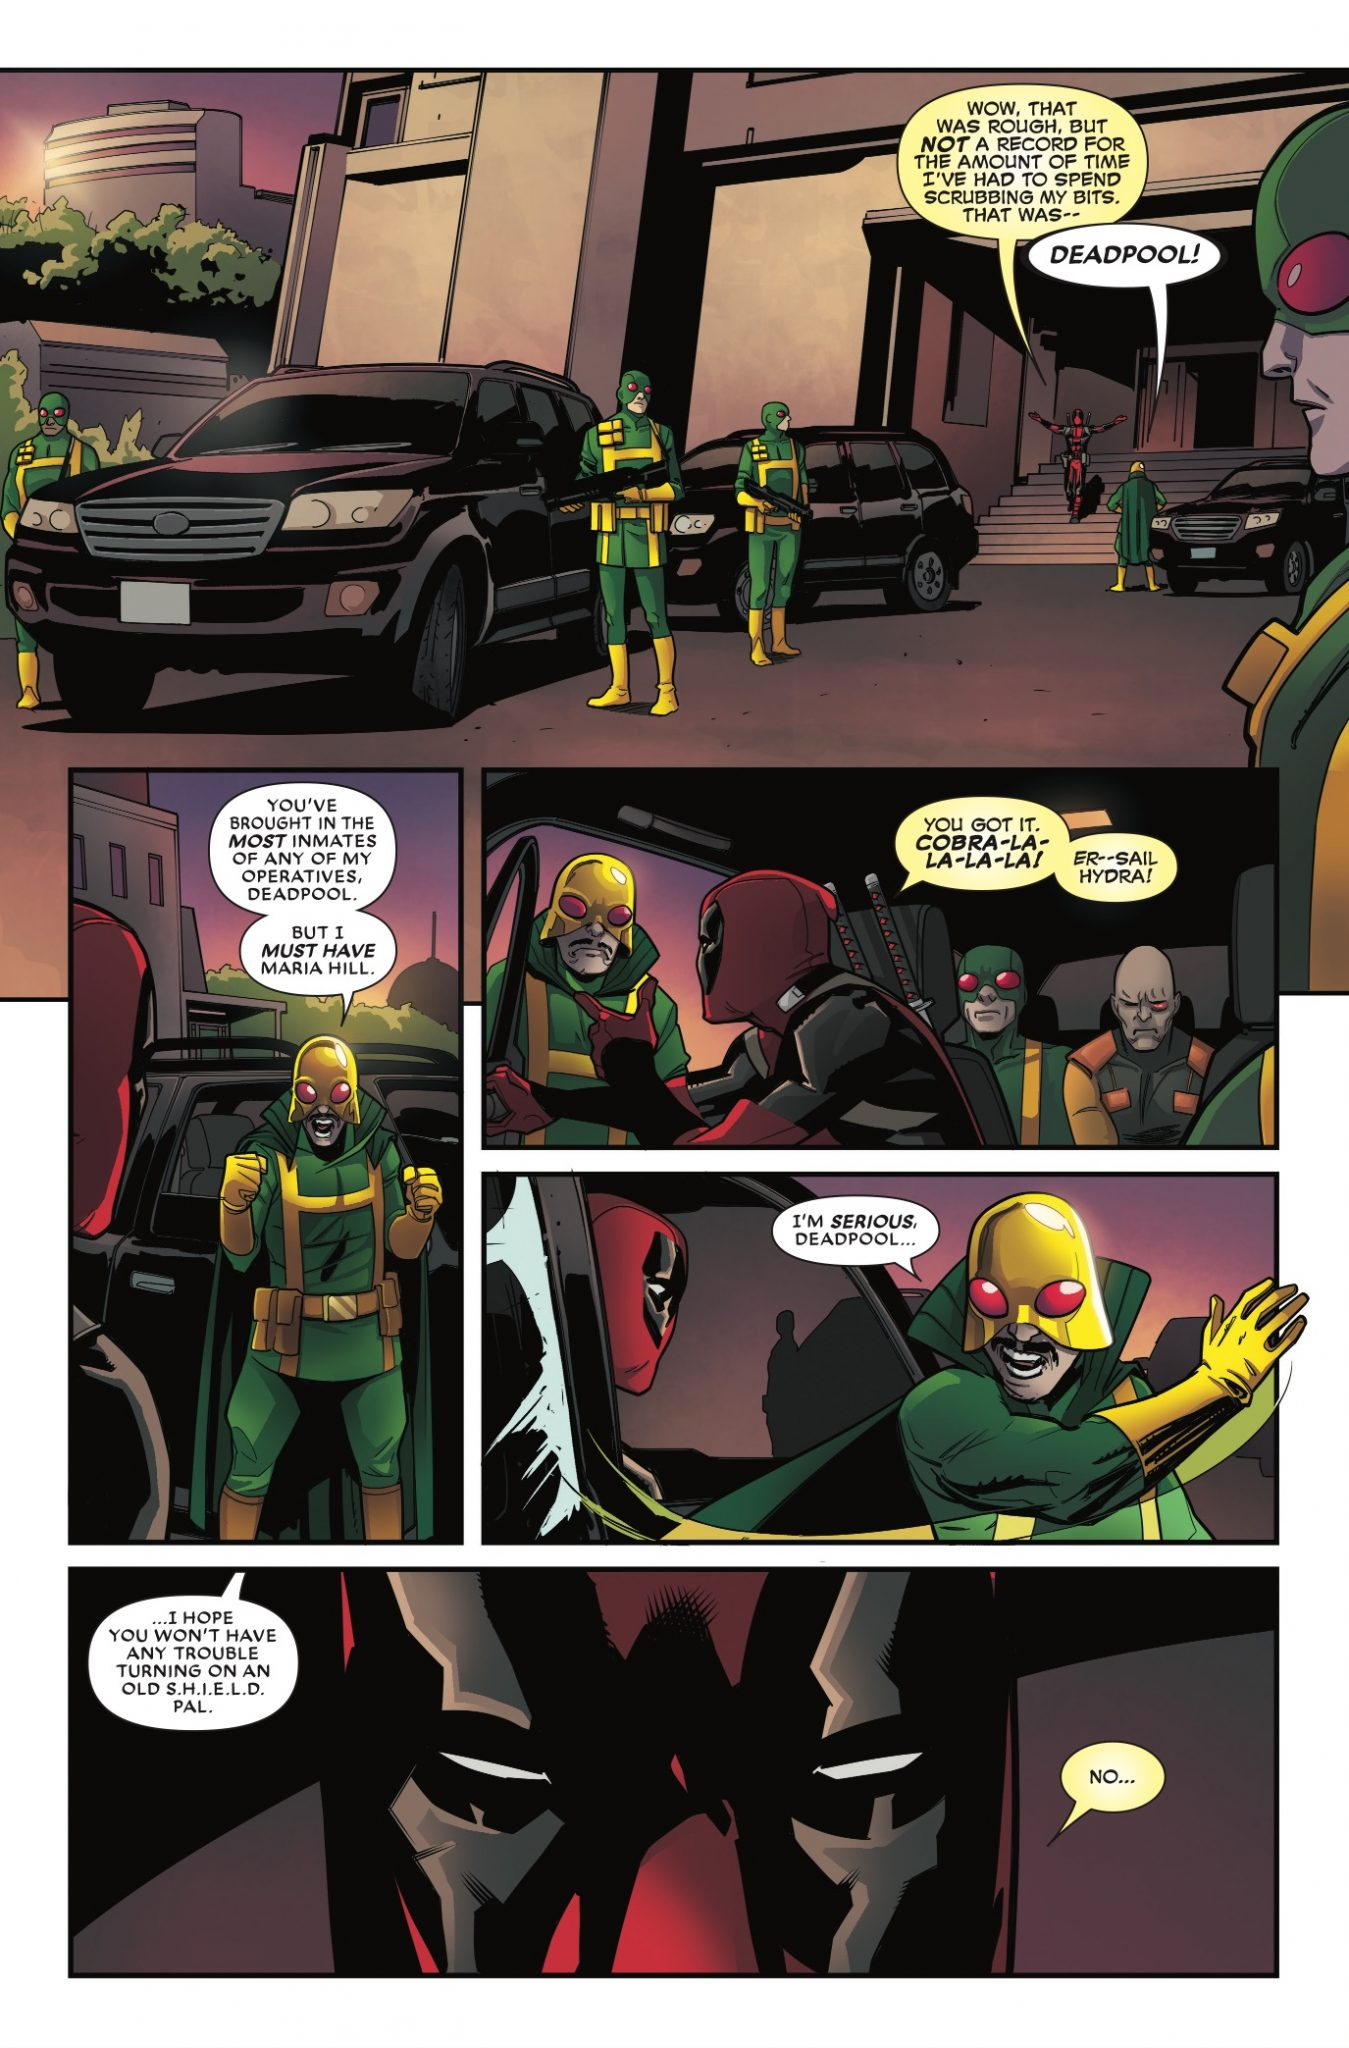 Deadpool #34 Review